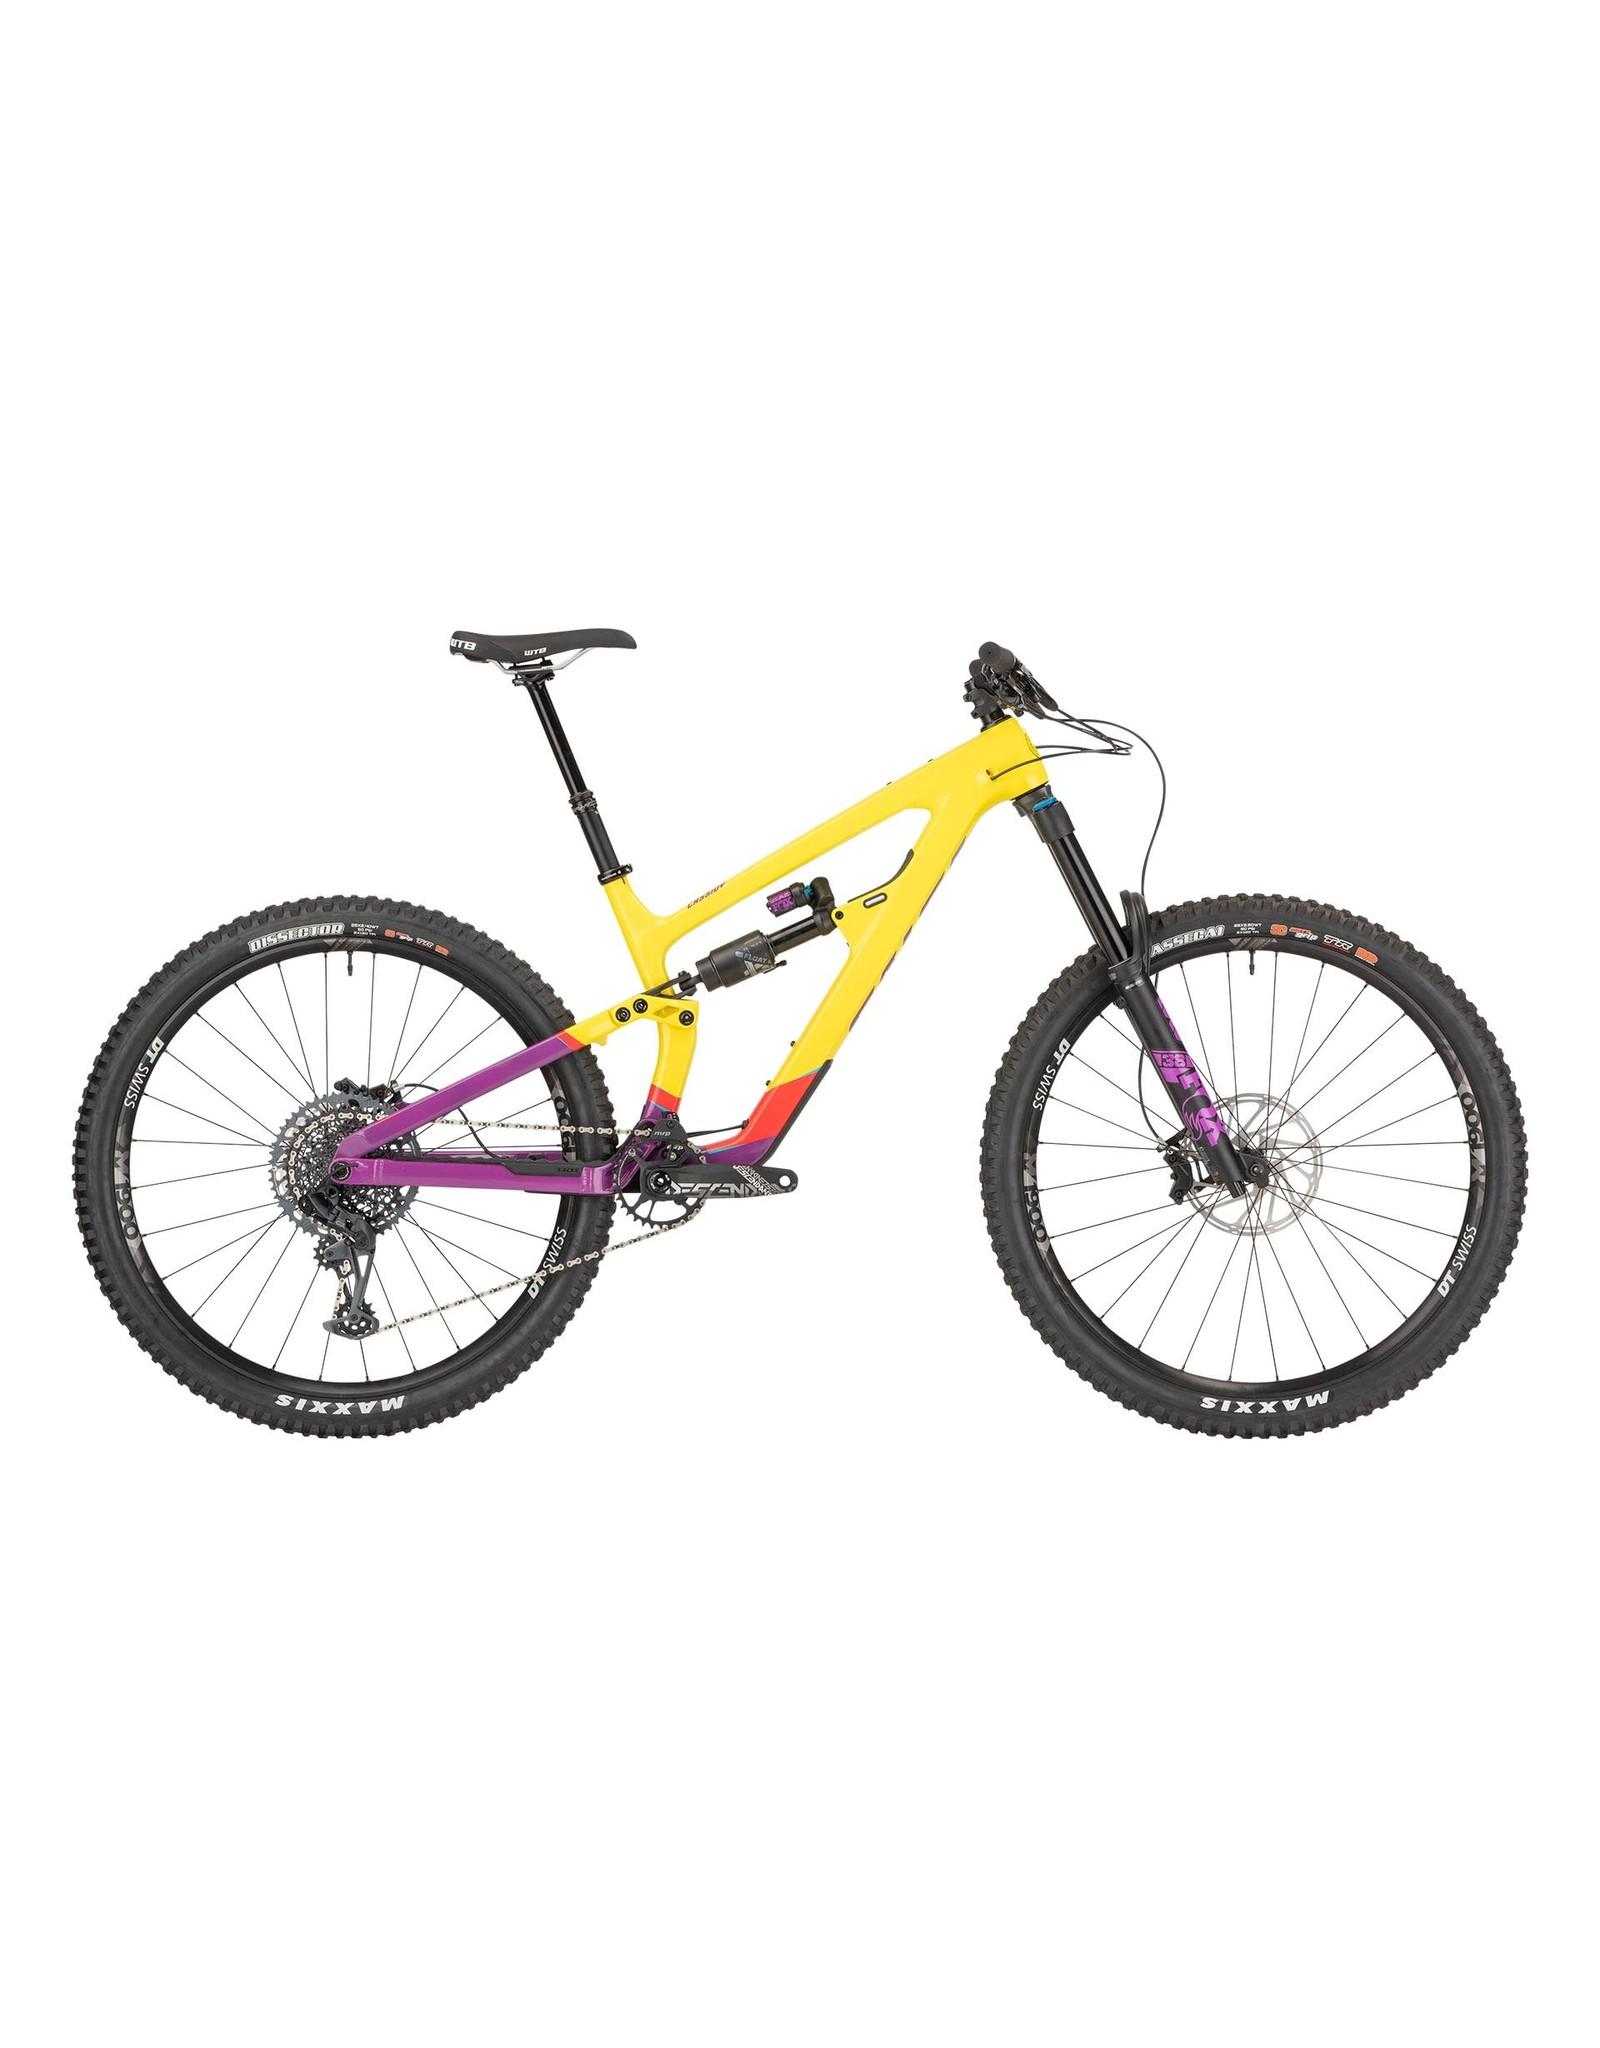 "Salsa 2021 Salsa Cassidy Carbon GX Eagle Bike - 29"", Carbon, Yellow/Purple"